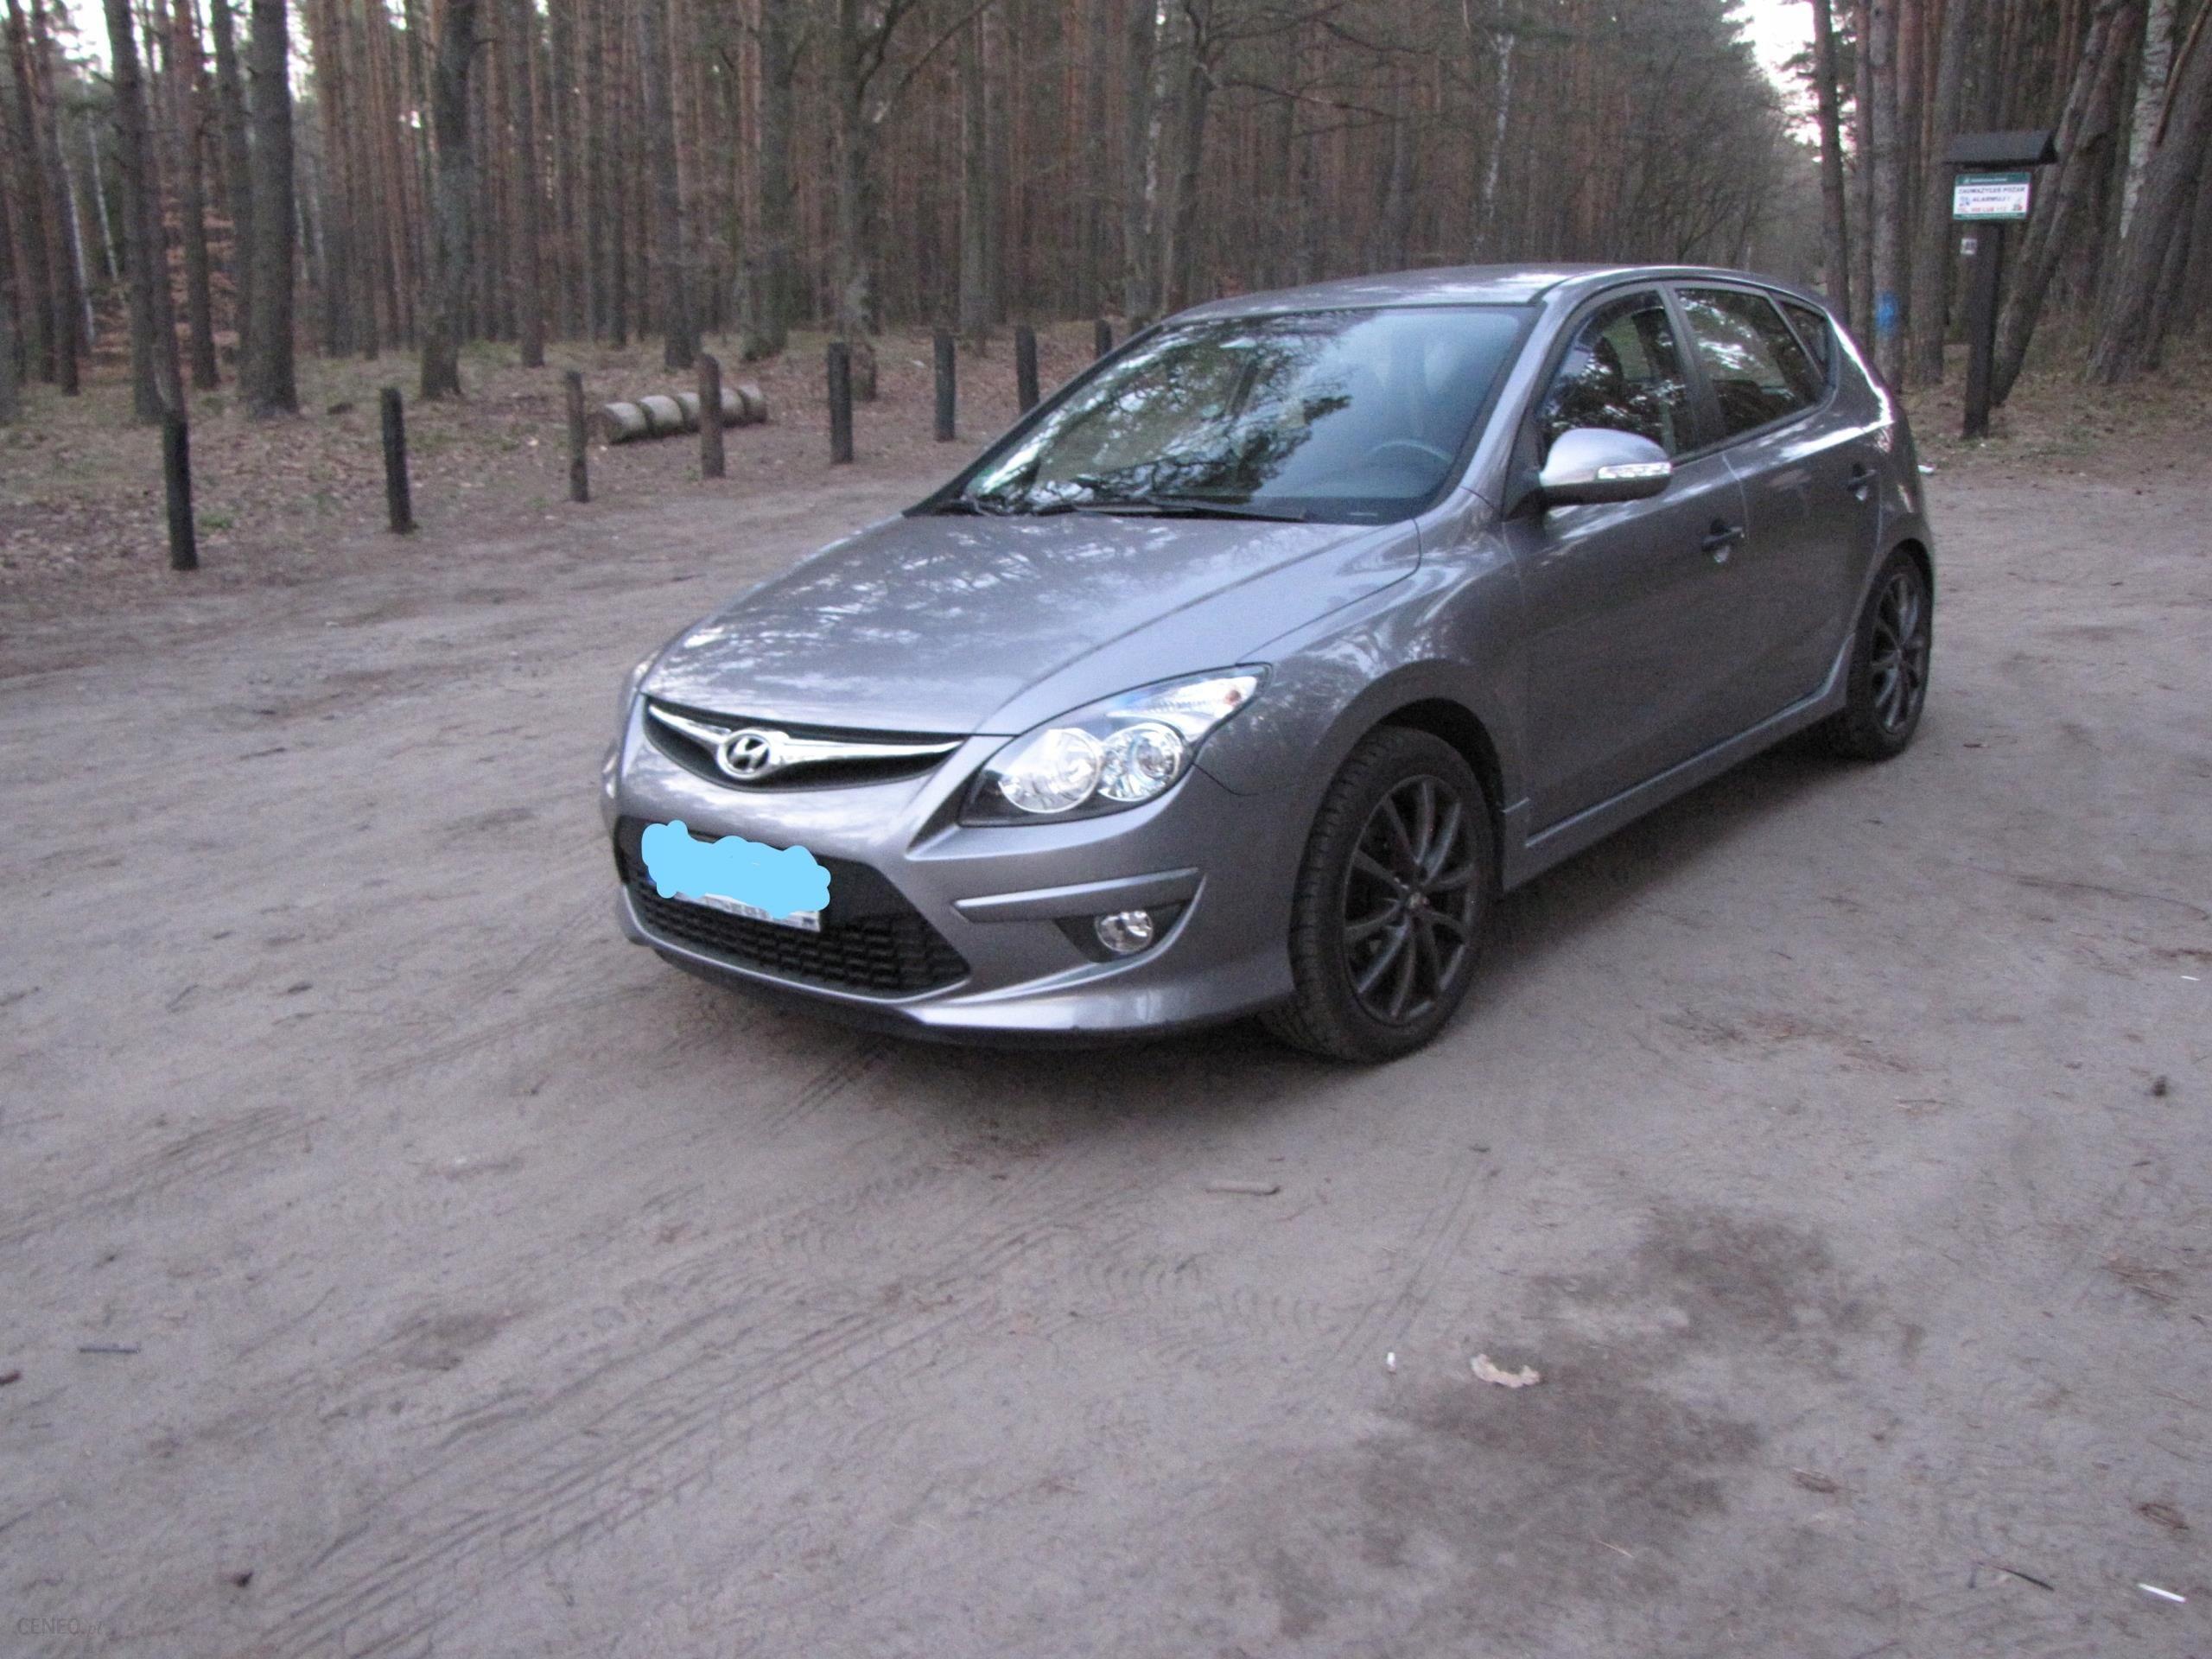 103dfda68ea891 Hyundai i30 1.4 Benzyna+Gaz EDITION 20 - Opinie i ceny na Ceneo.pl